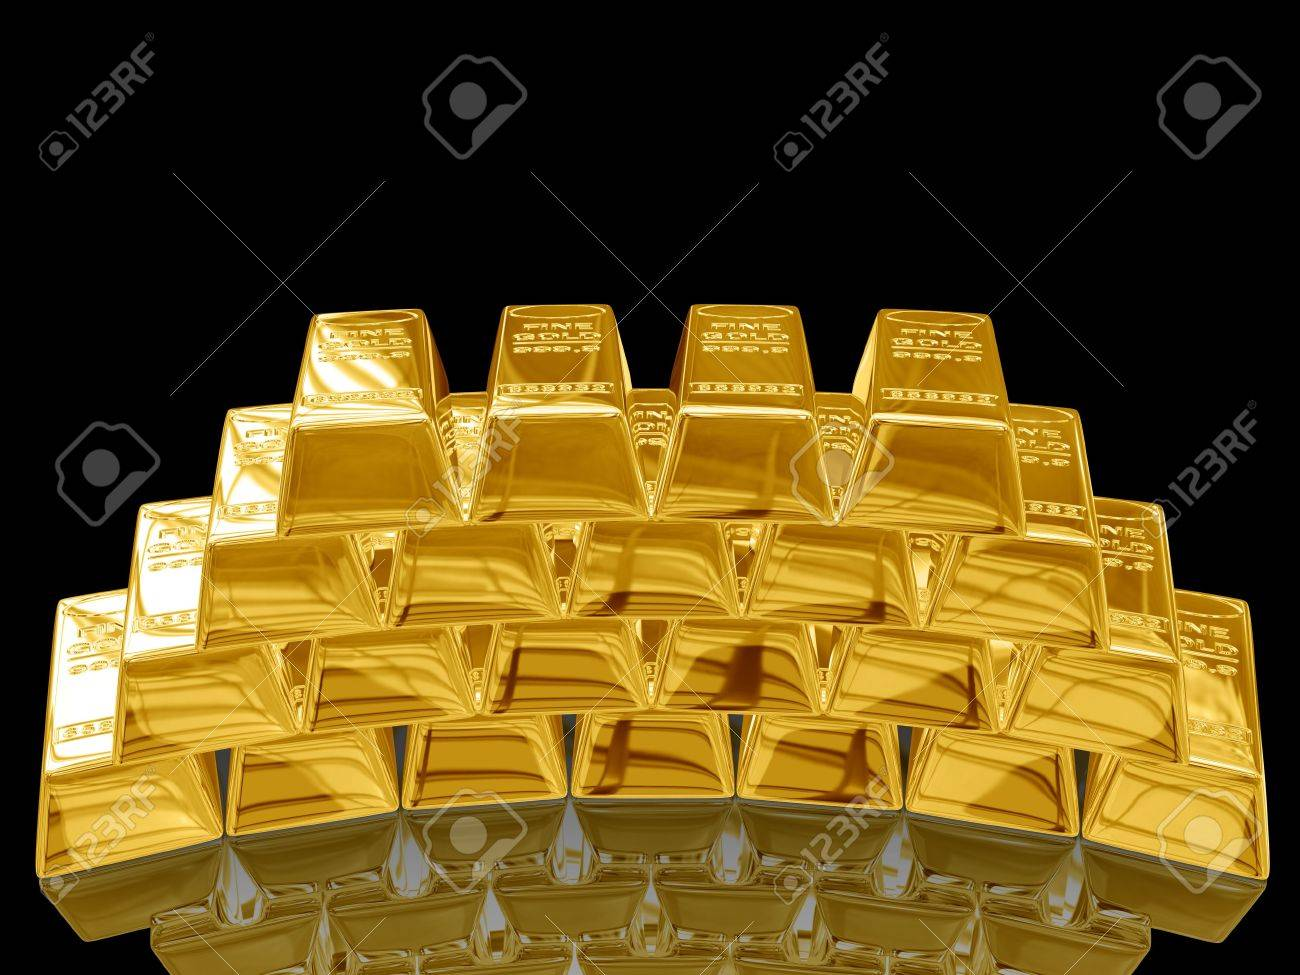 Isolated gold bars on black background. Stock Photo - 3919545